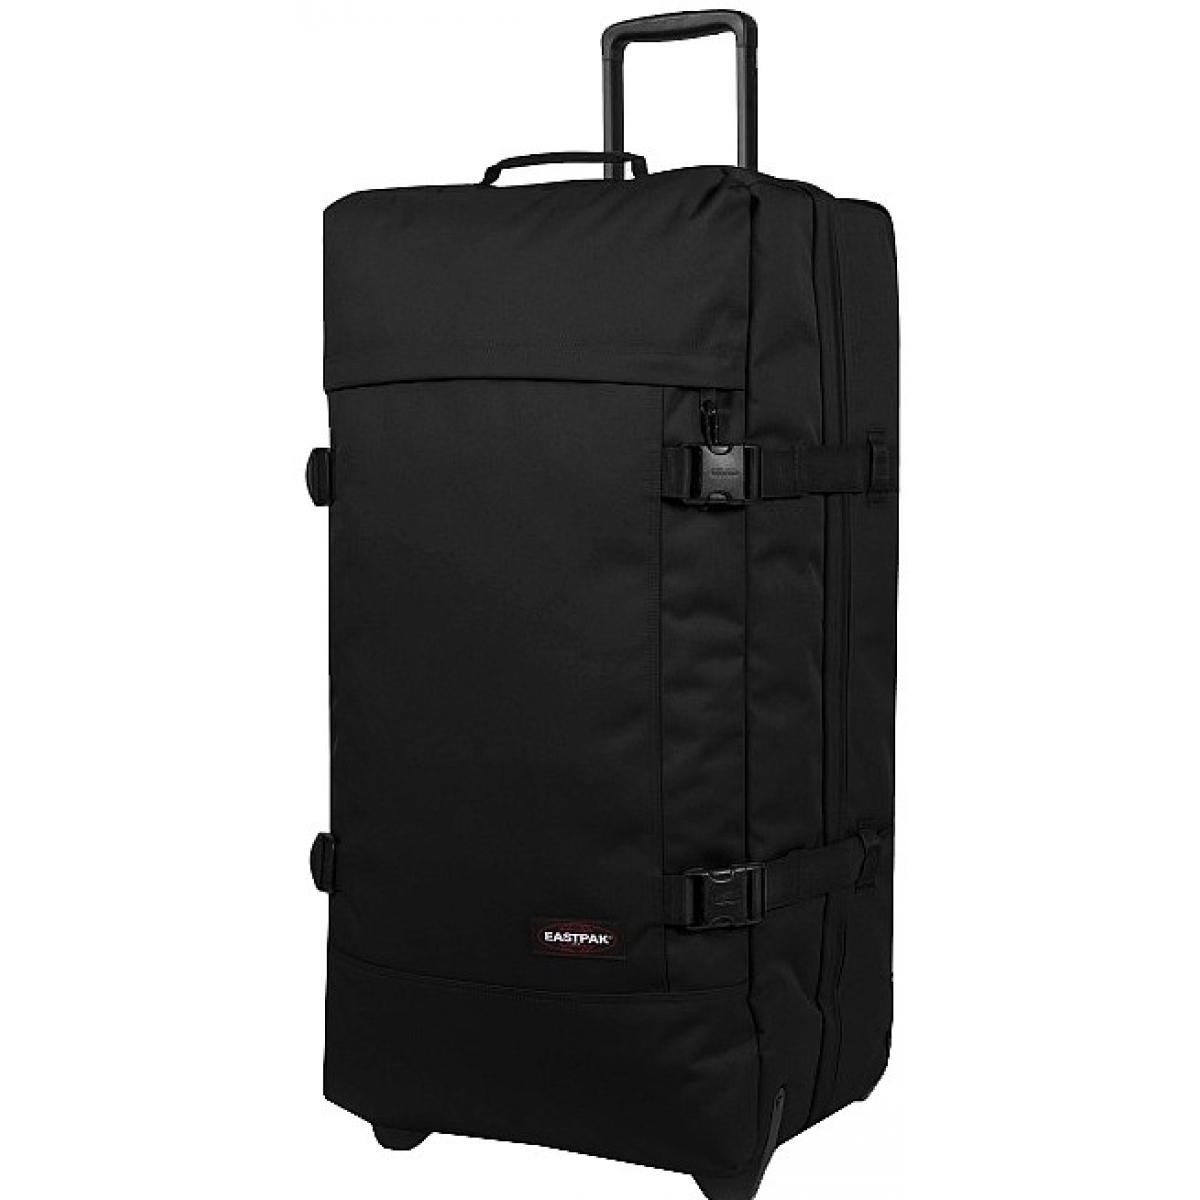 sac de voyage roulettes eastpak tranverz l ek63l ek63l008 couleur principale assortis. Black Bedroom Furniture Sets. Home Design Ideas